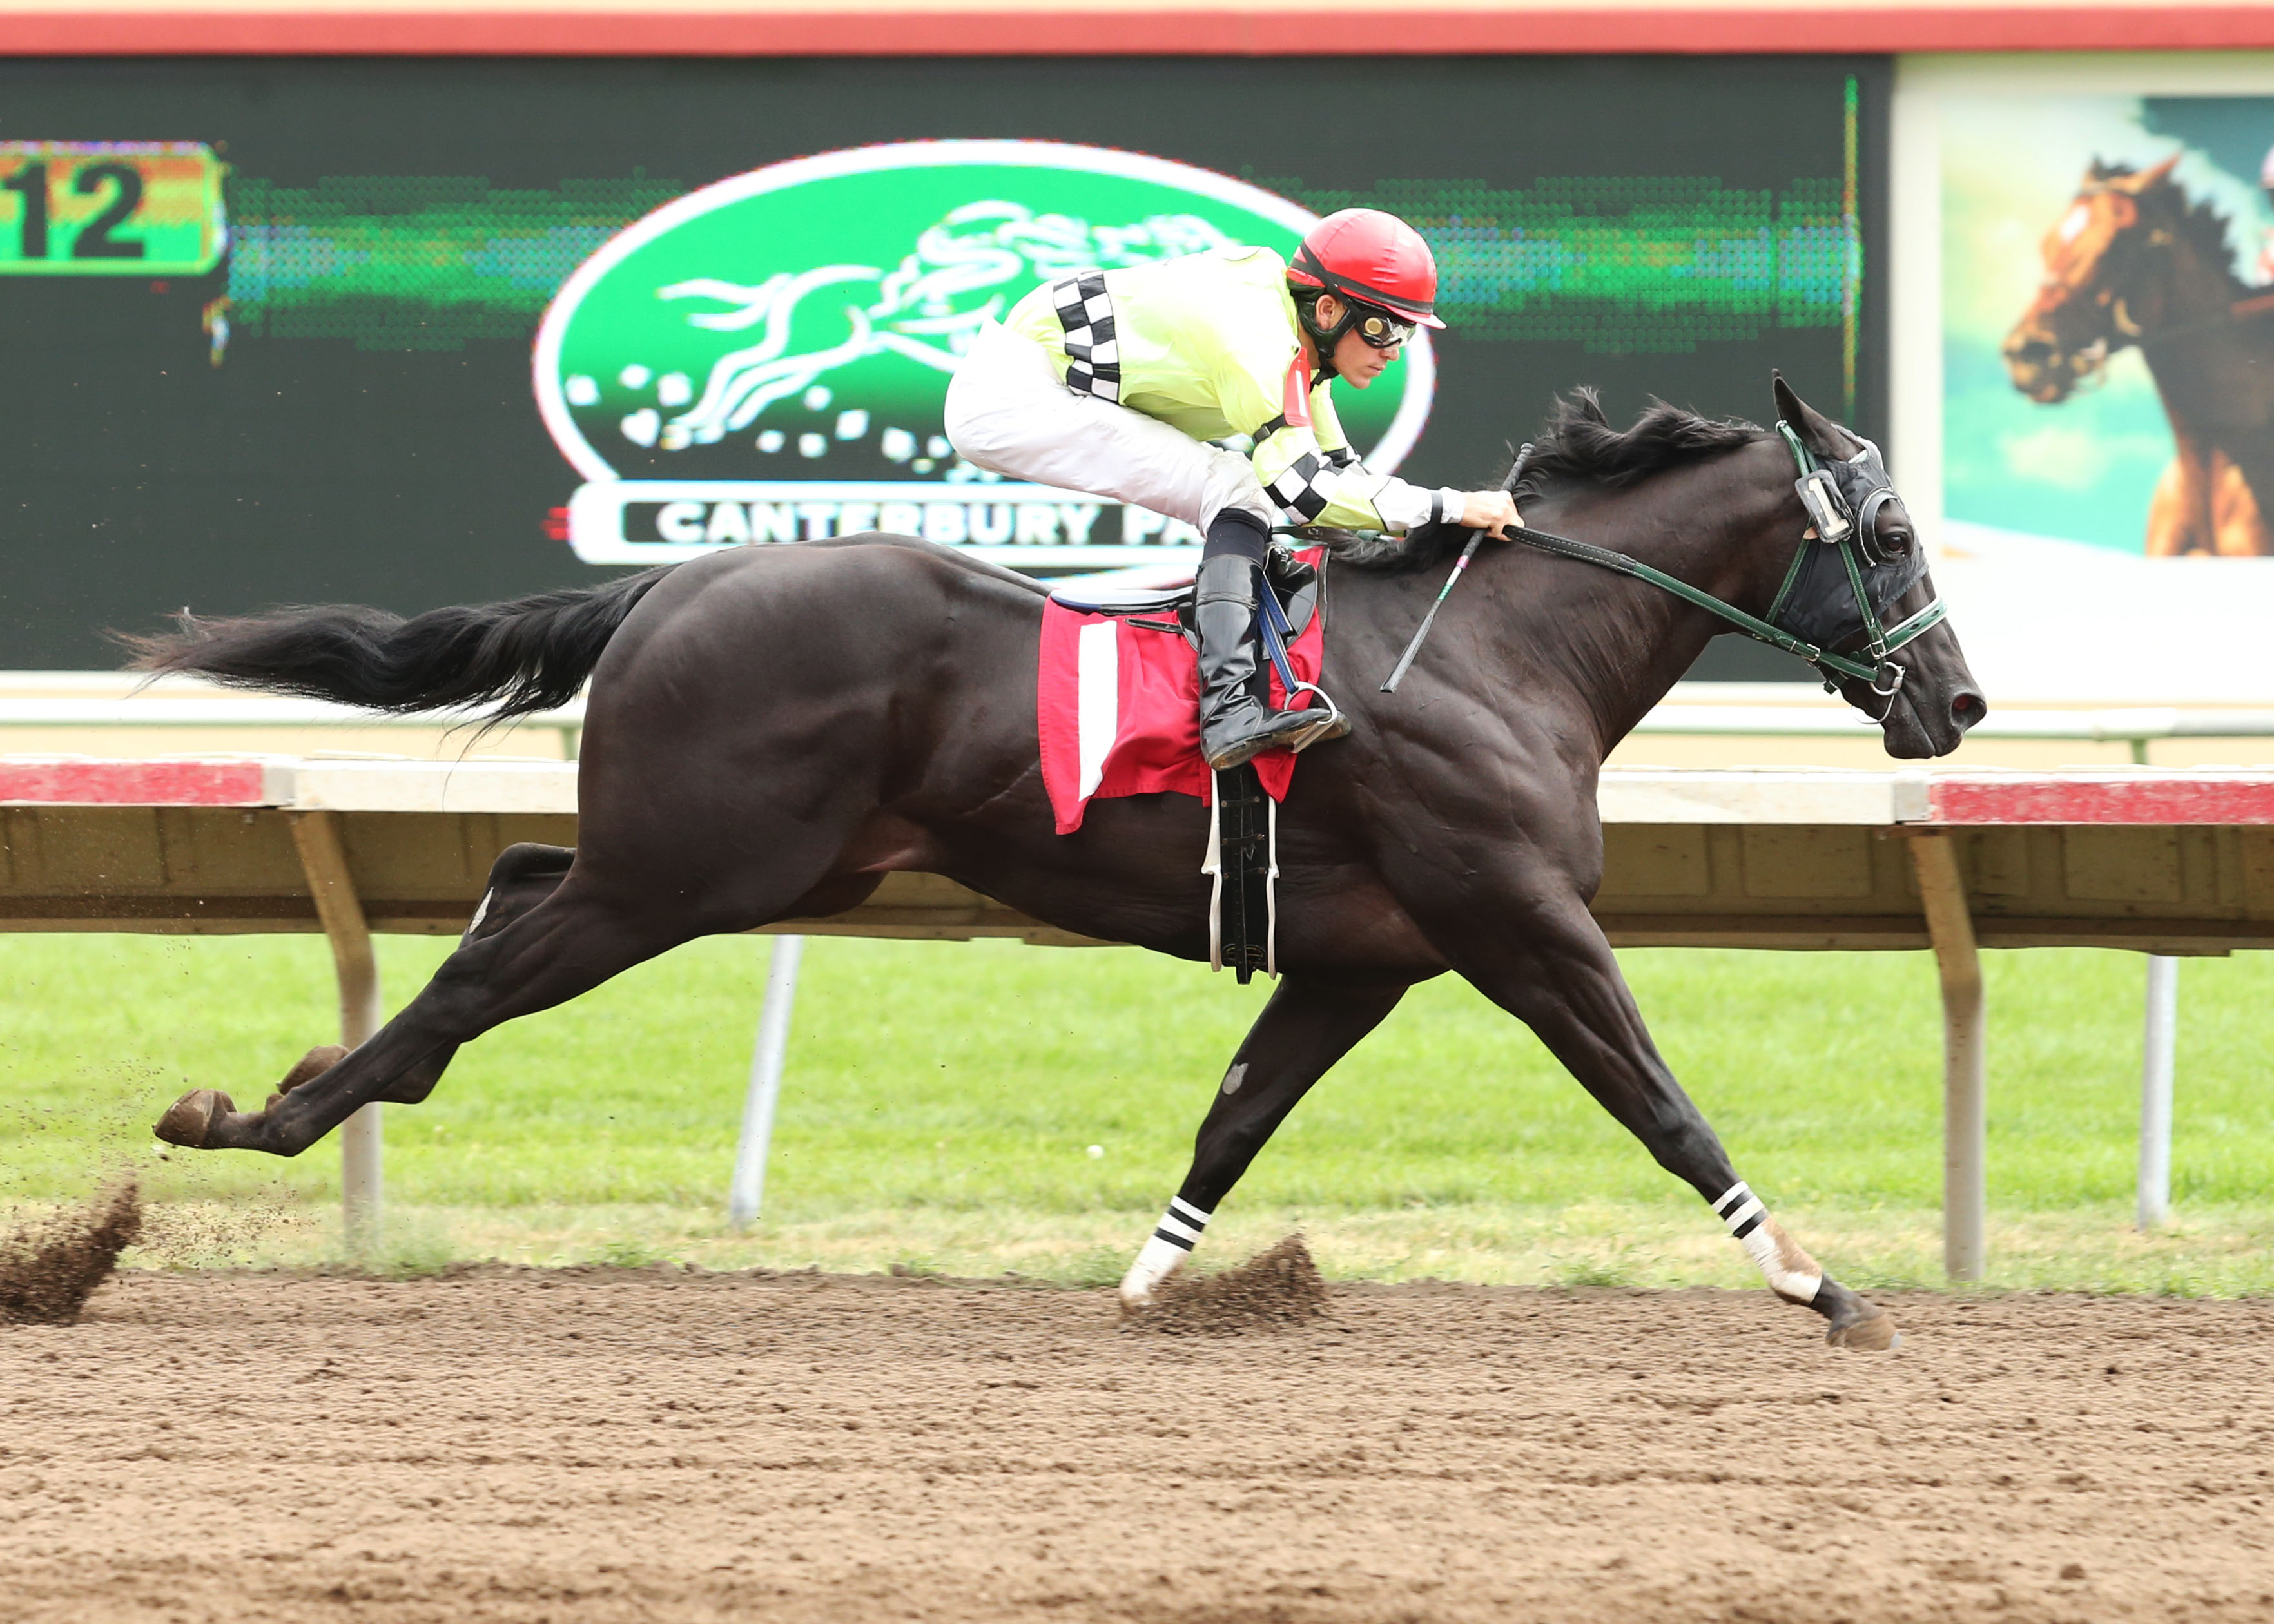 Sportwagon - Minnesota Quarter Horse Futurity - 09-01-13 - R02 - CBY - Finish